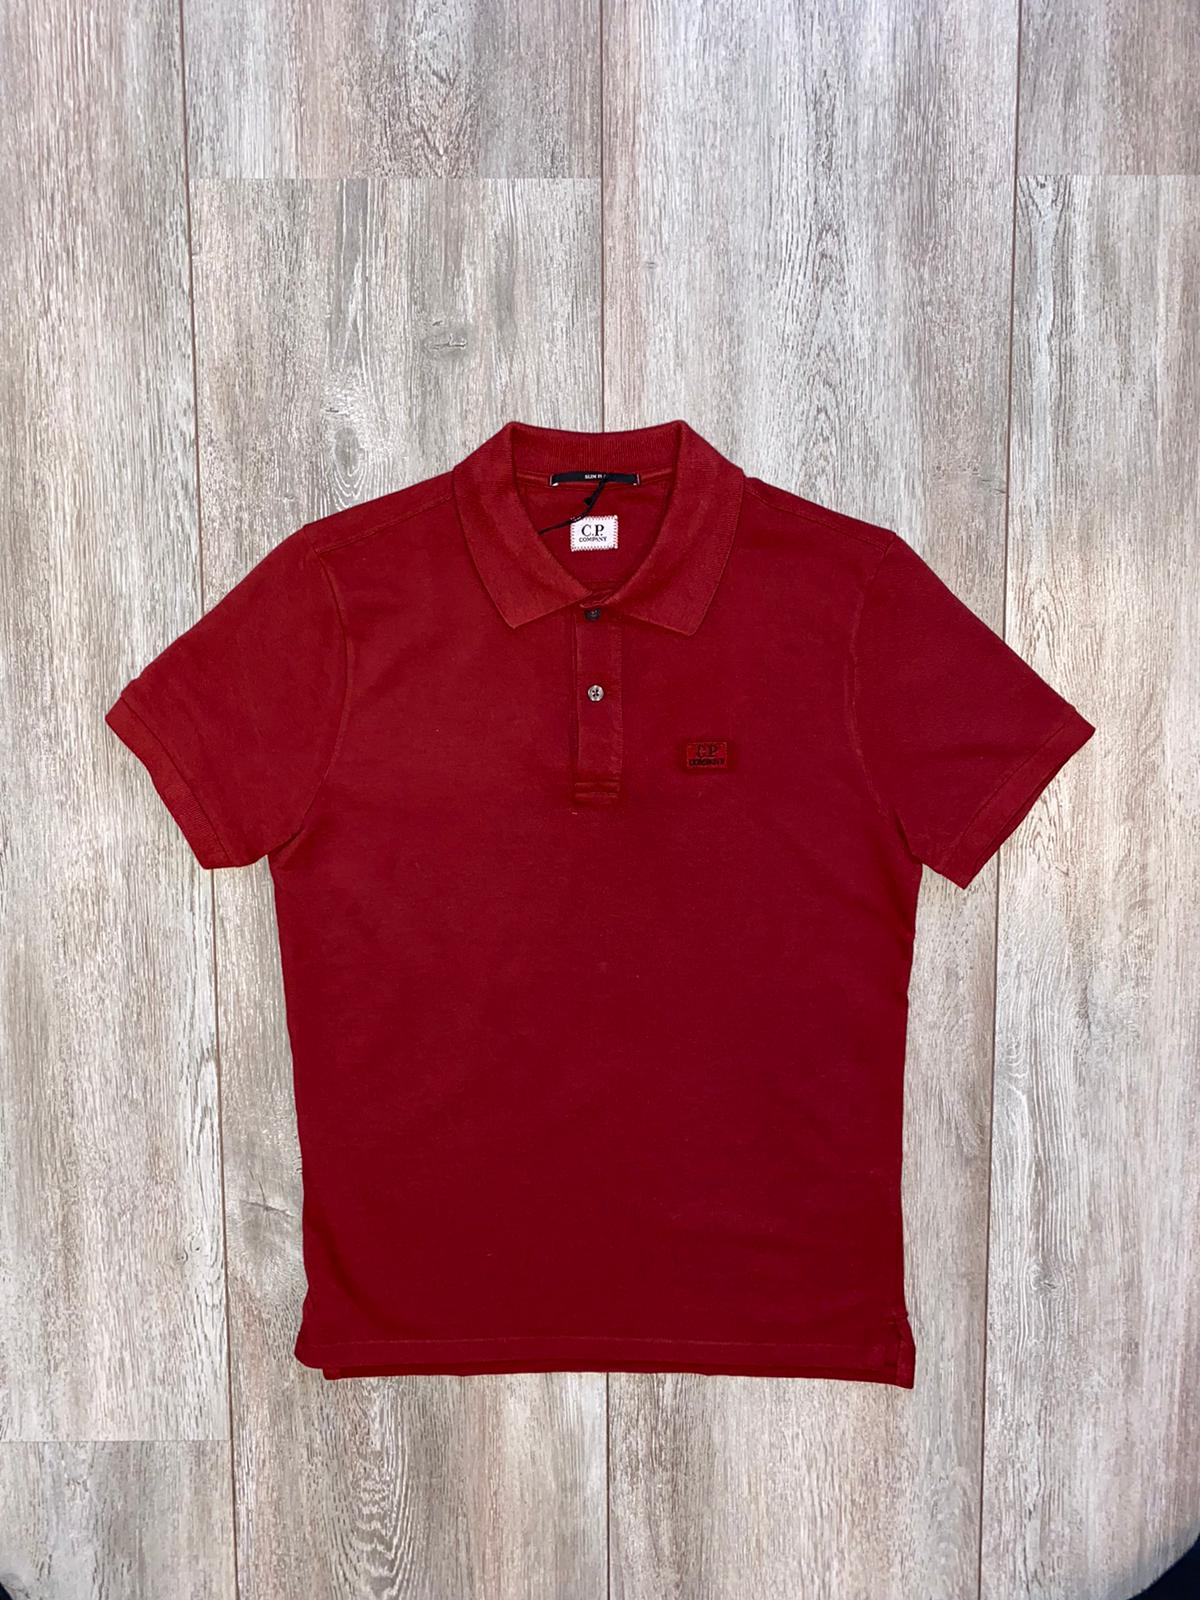 corp slim fit shirt